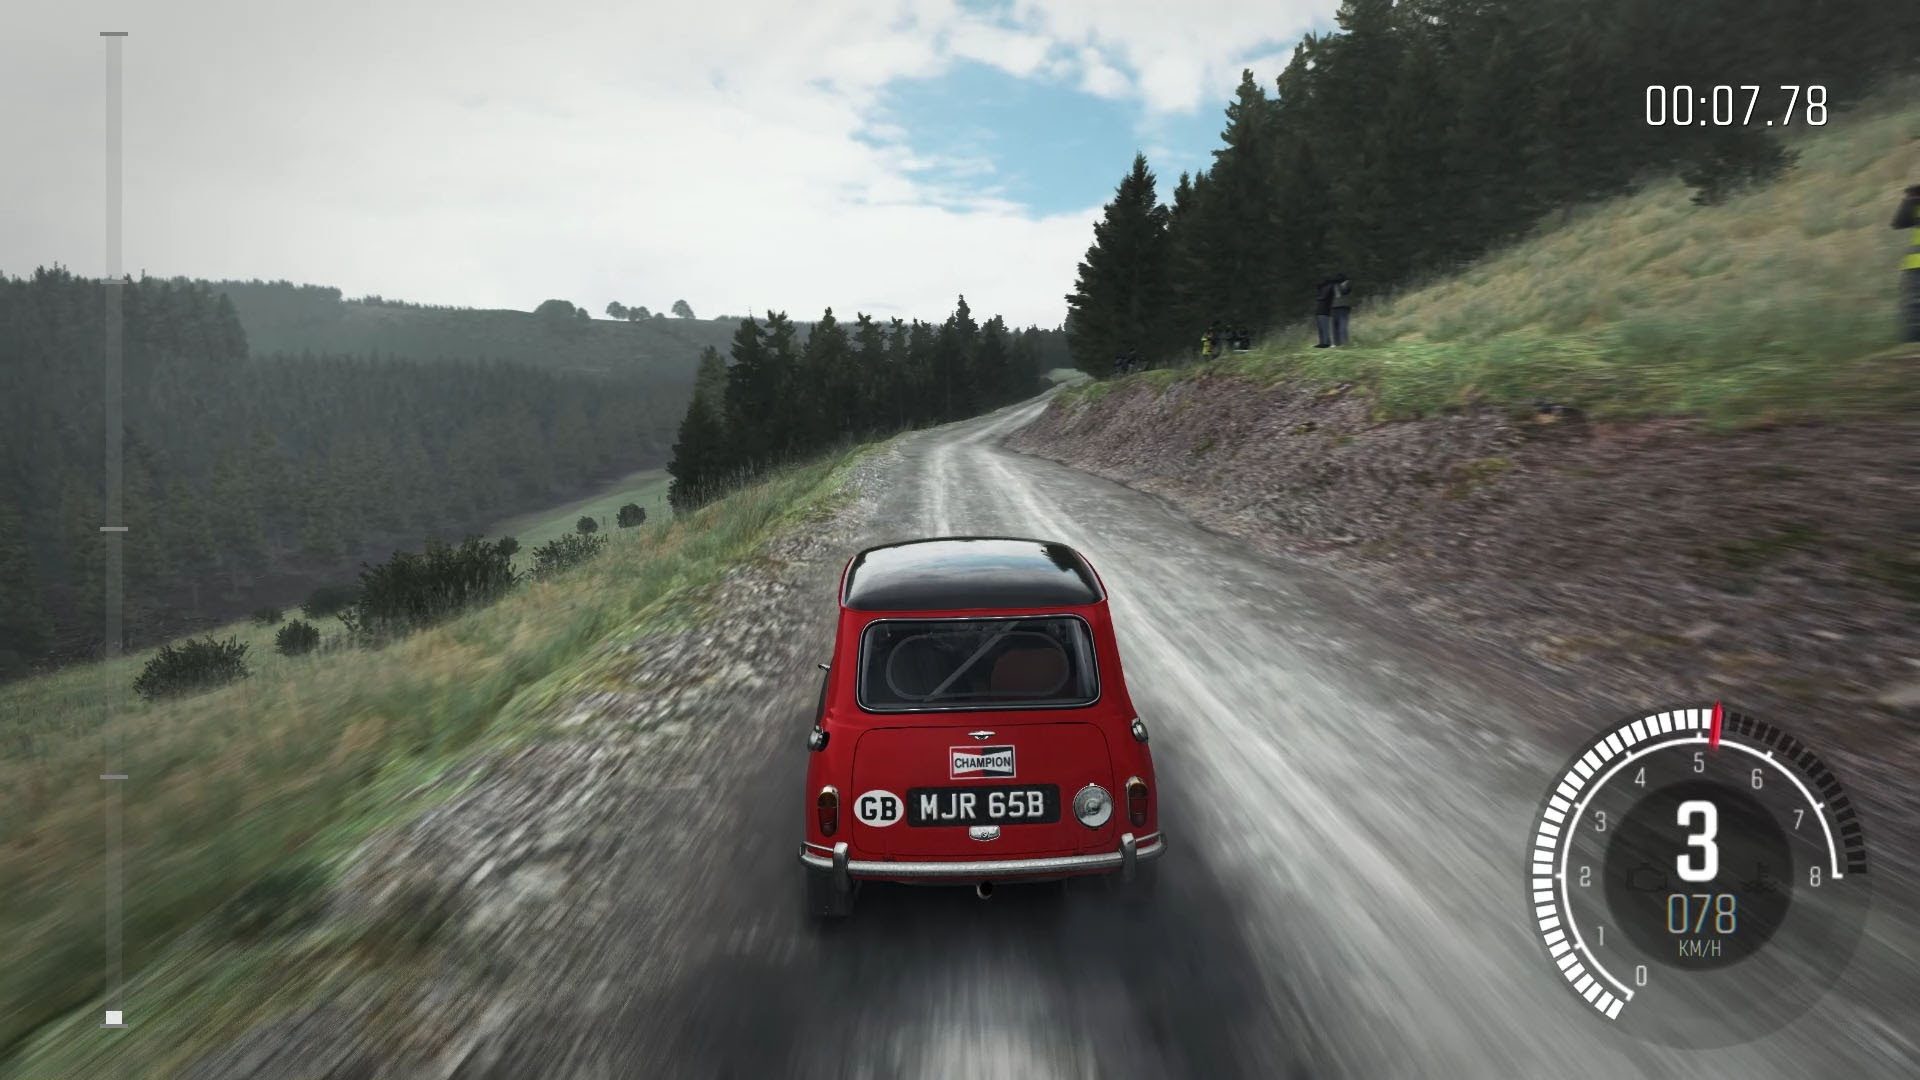 DiRT Rally [v 1.23] (2015/PC/Русский), RePack от xatab